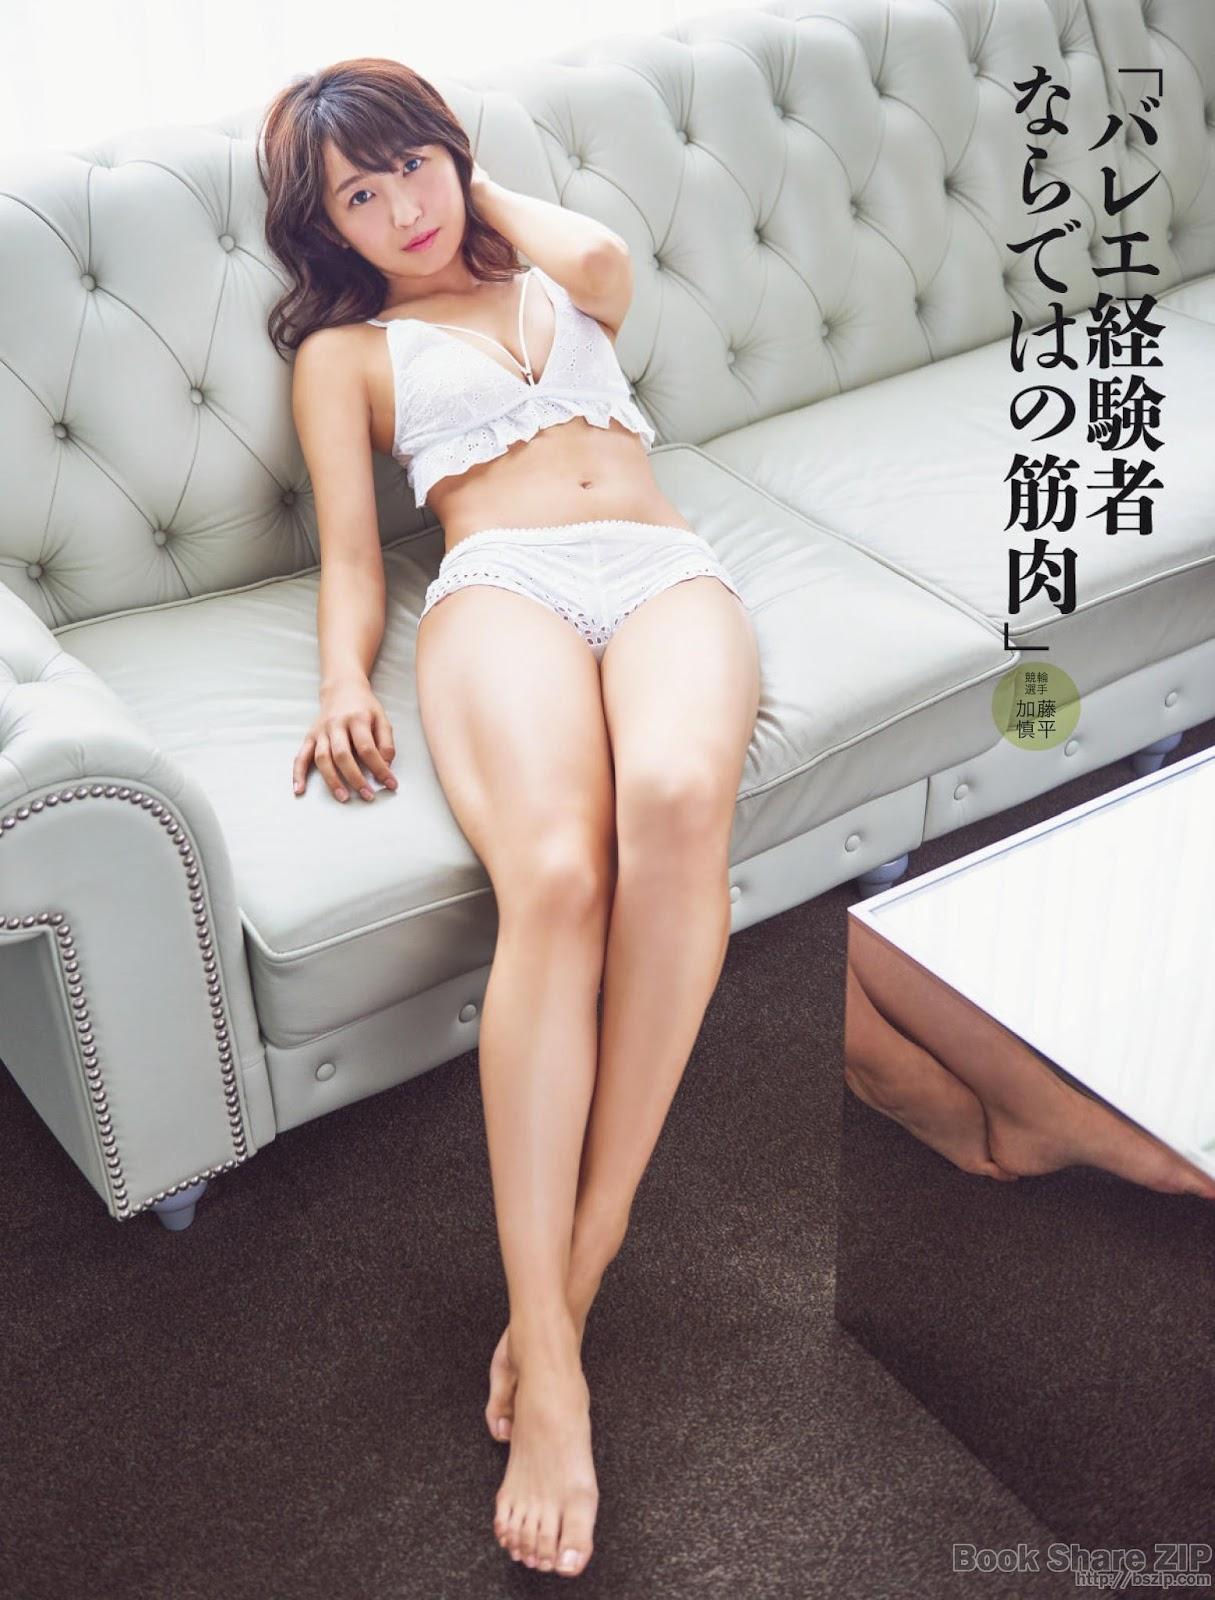 Souda Sarina 惣田紗莉渚, Weekly SPA! 2018.02.06 (週刊SPA! 2018年2月6日号)